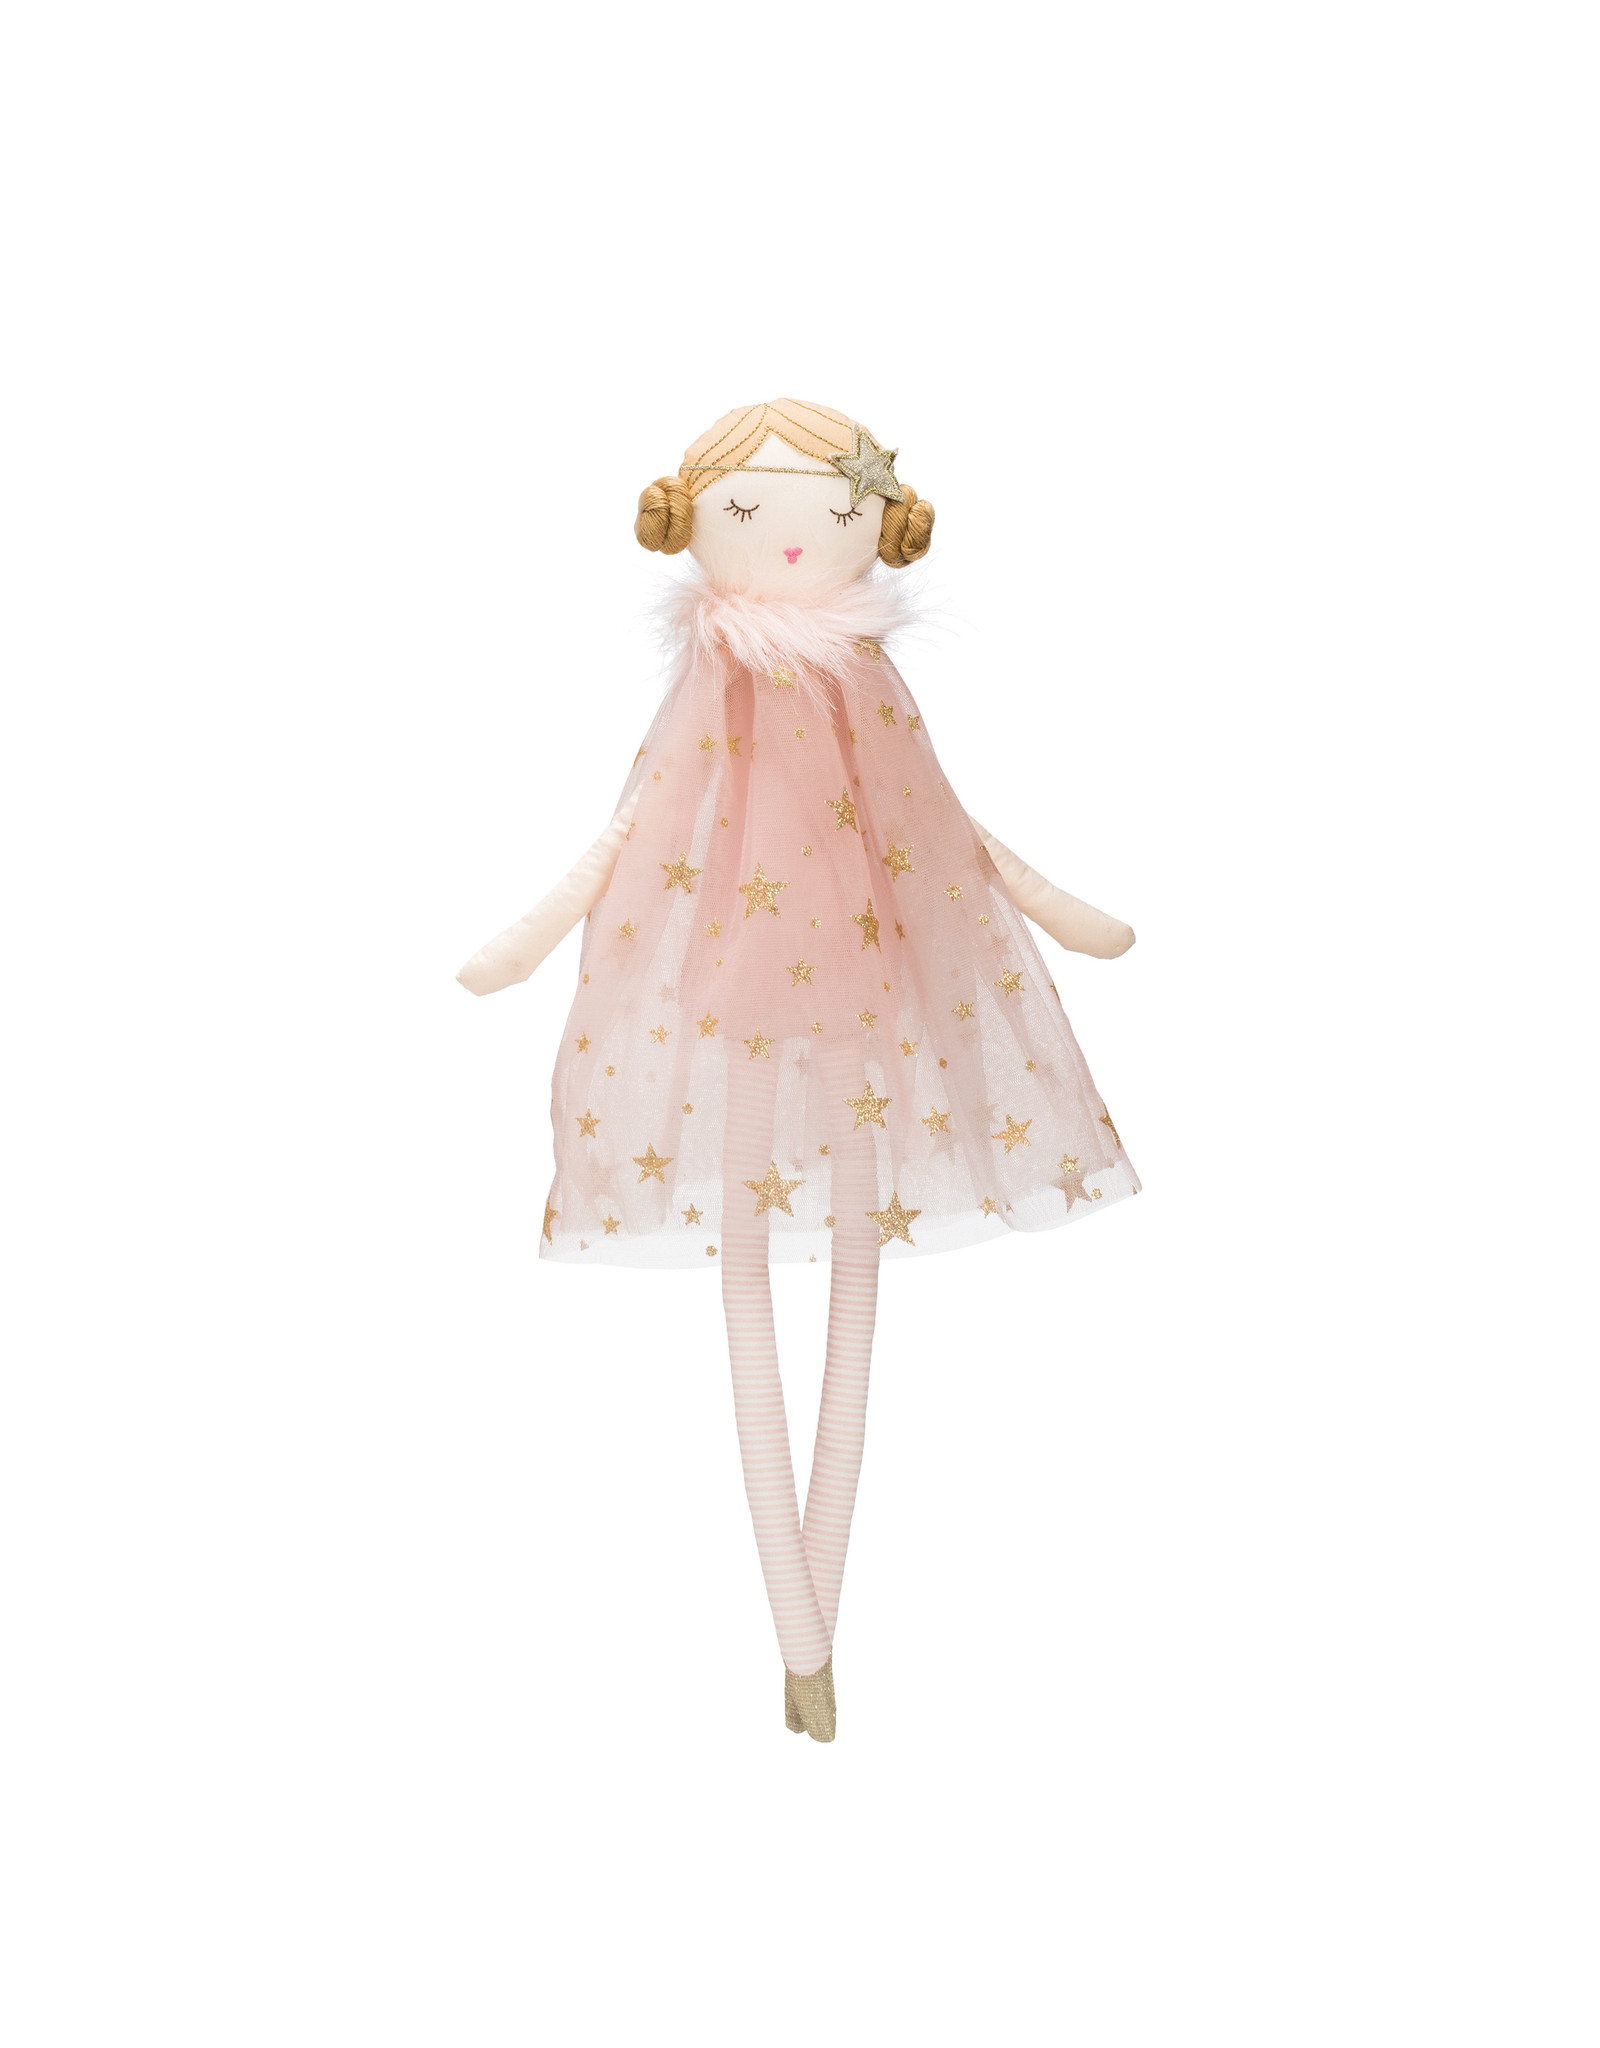 Plush Ballerina Doll with Pink & Gold Star Dress